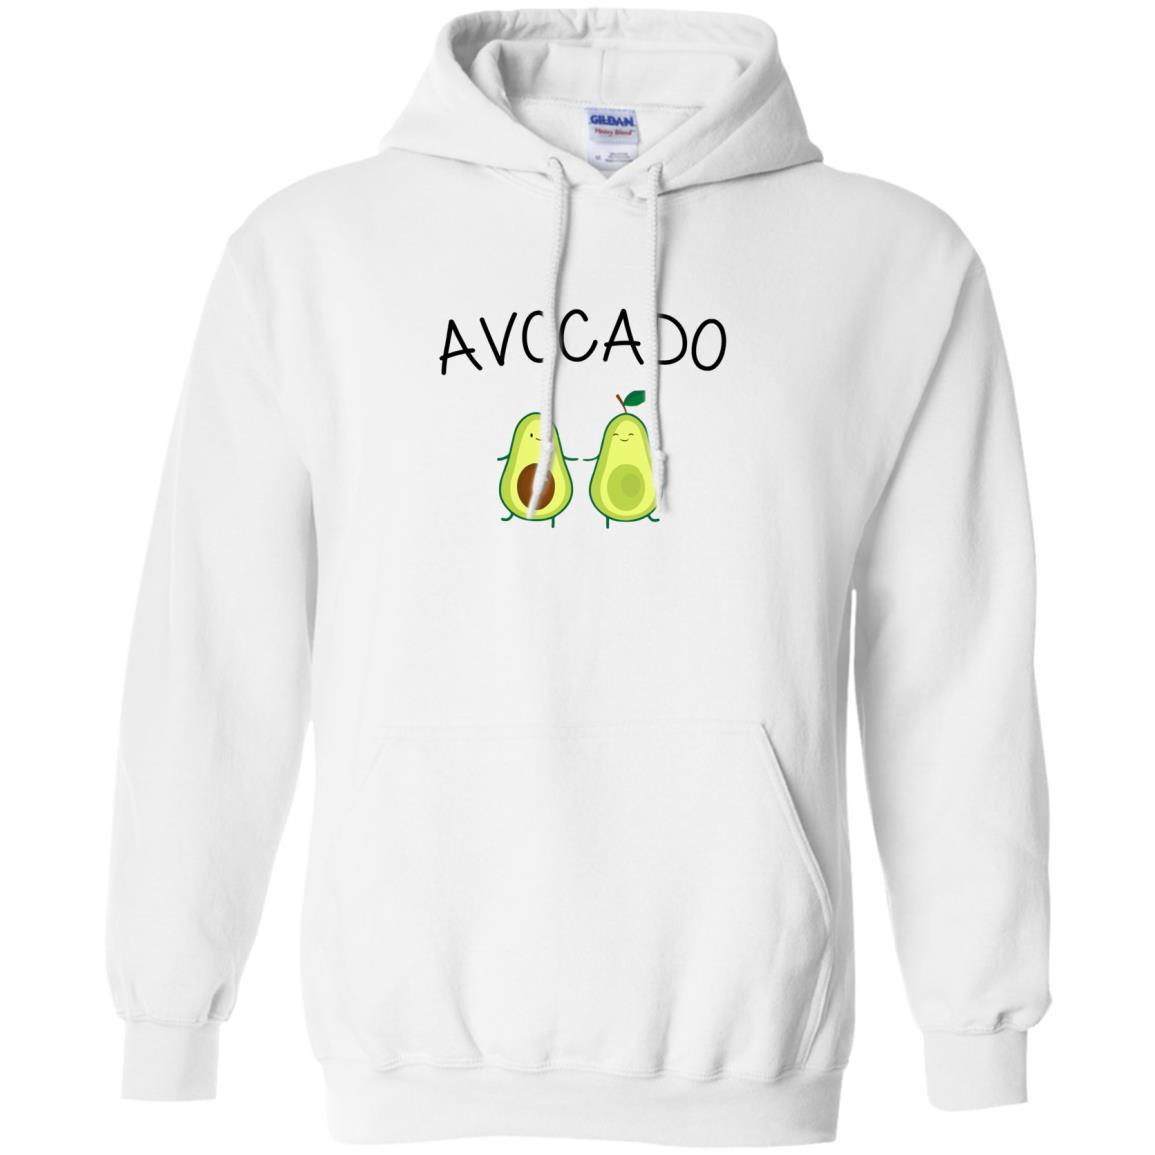 image 18 - Vegan Avocado Shirt, Sweater, Hoodie